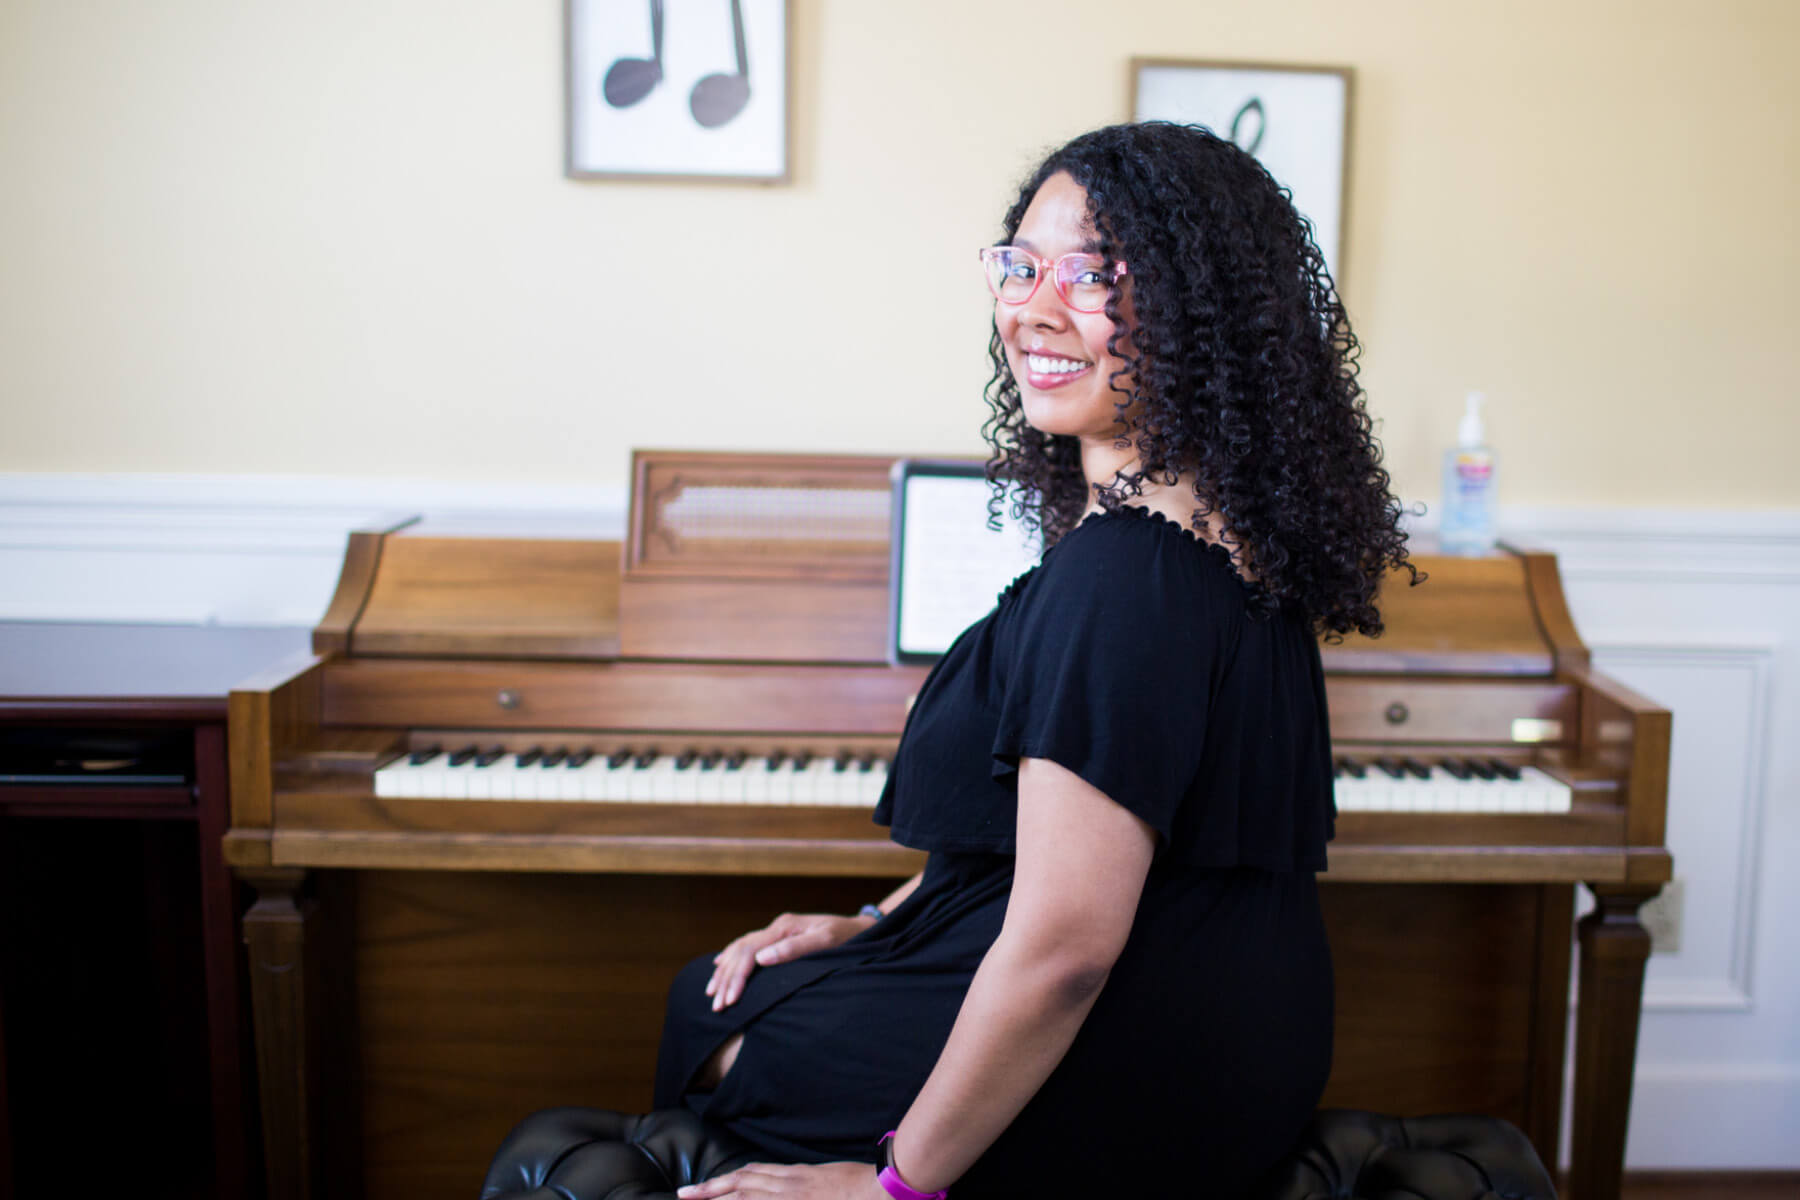 Piano instructor, looking over her shoulder.